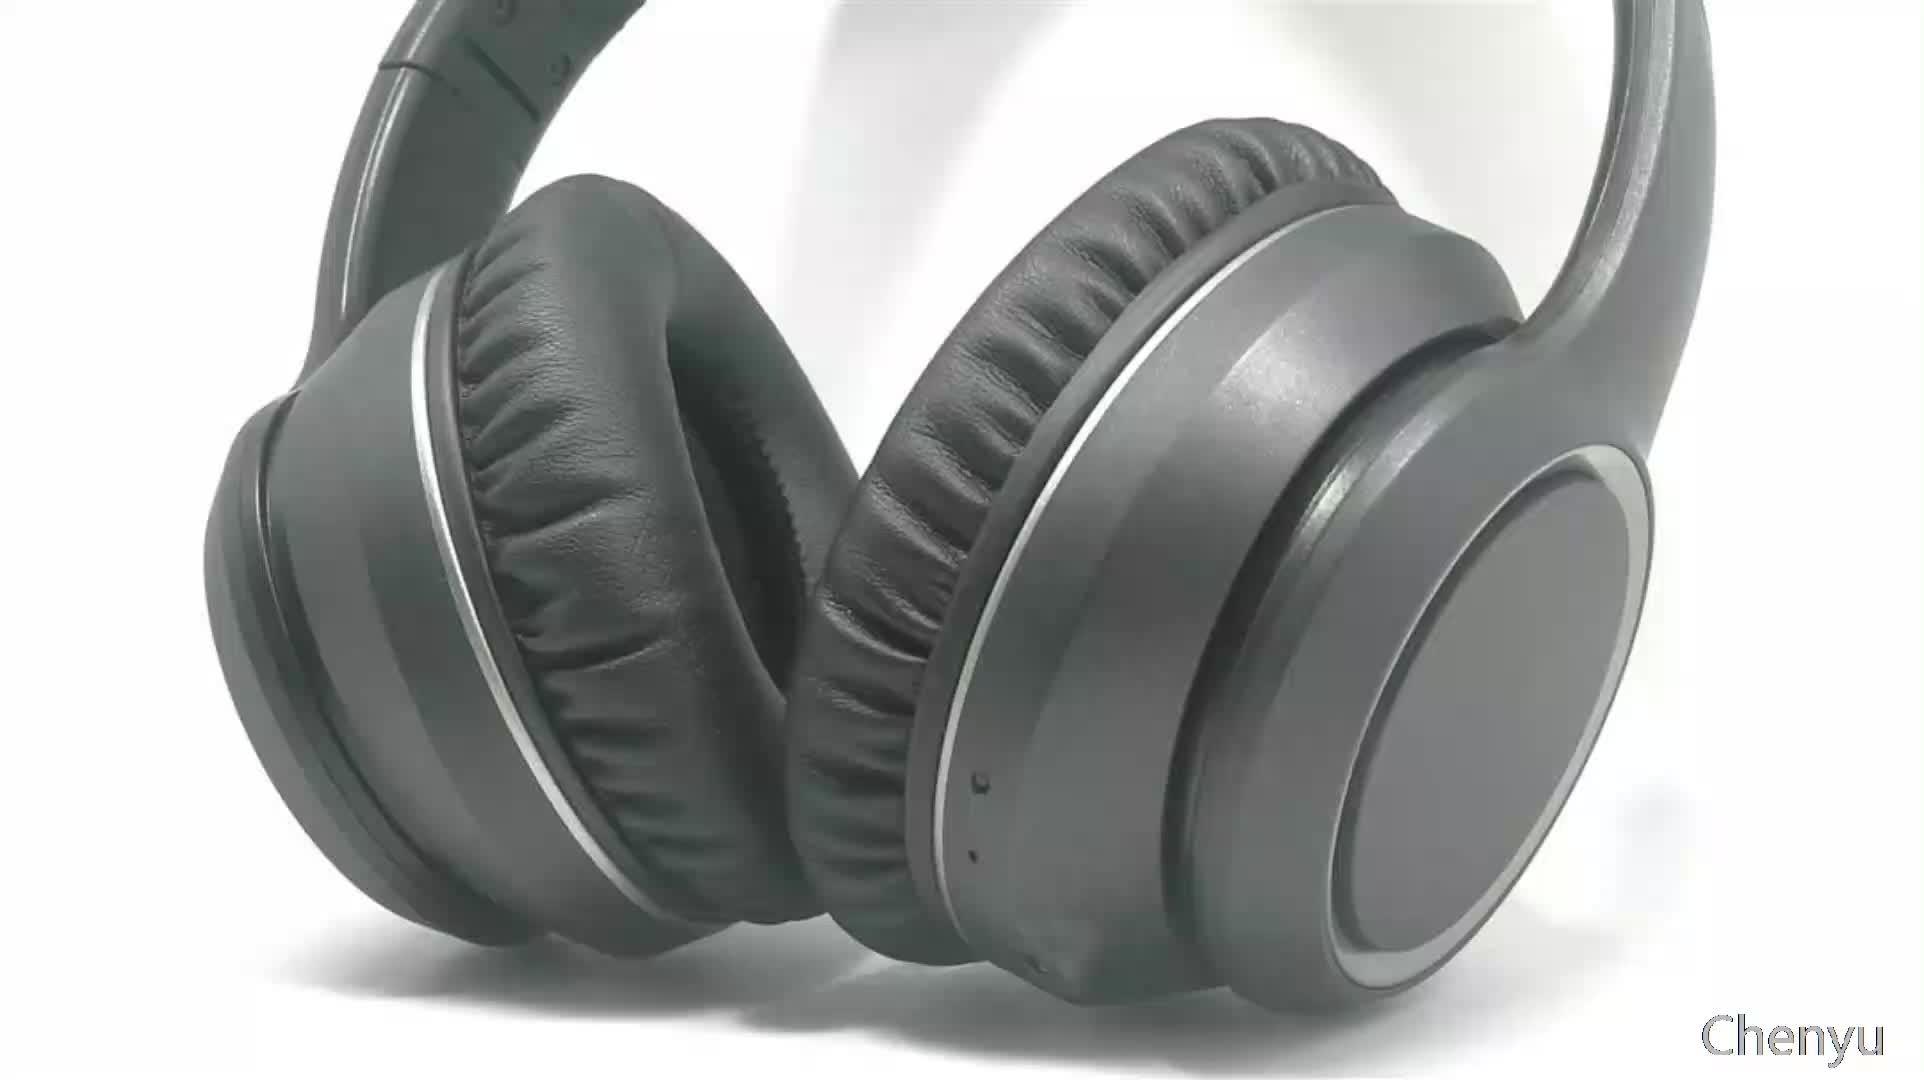 Wholesale OEM active noise cancelling headphone foldable headband design true stereo blue tooth anc tws headphone